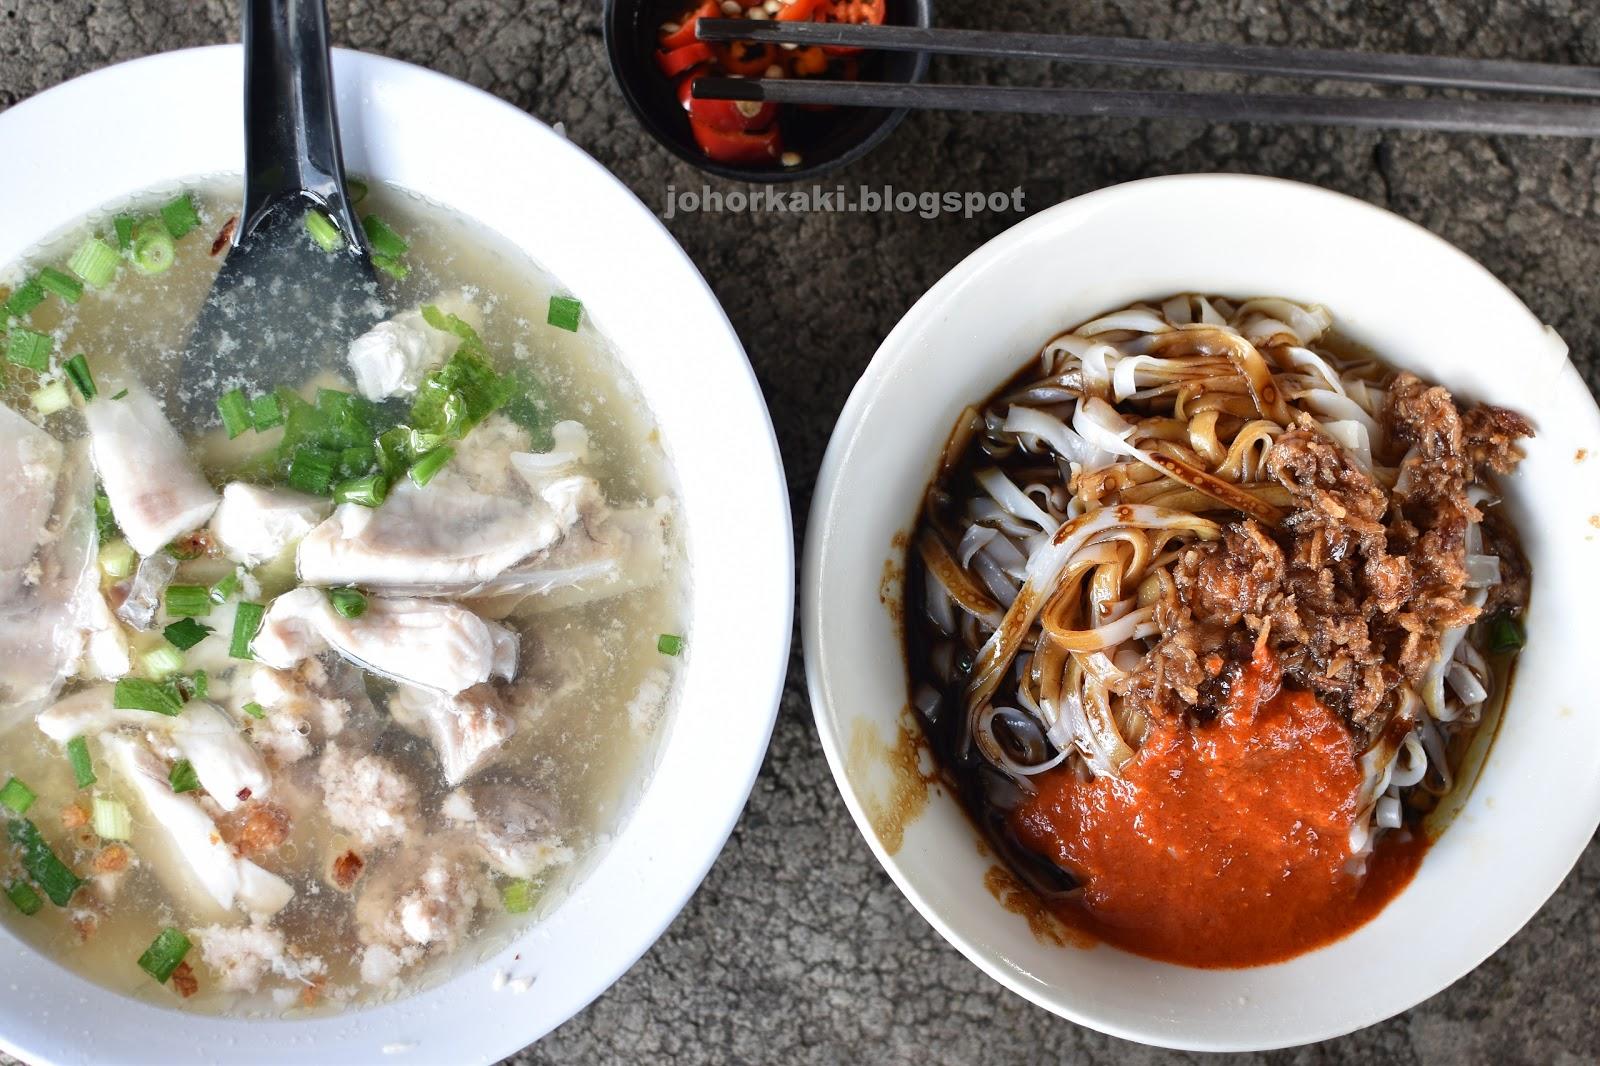 Johor bahru kebun teh seng huat fish soup jk1488 johor for Cuisine kaki